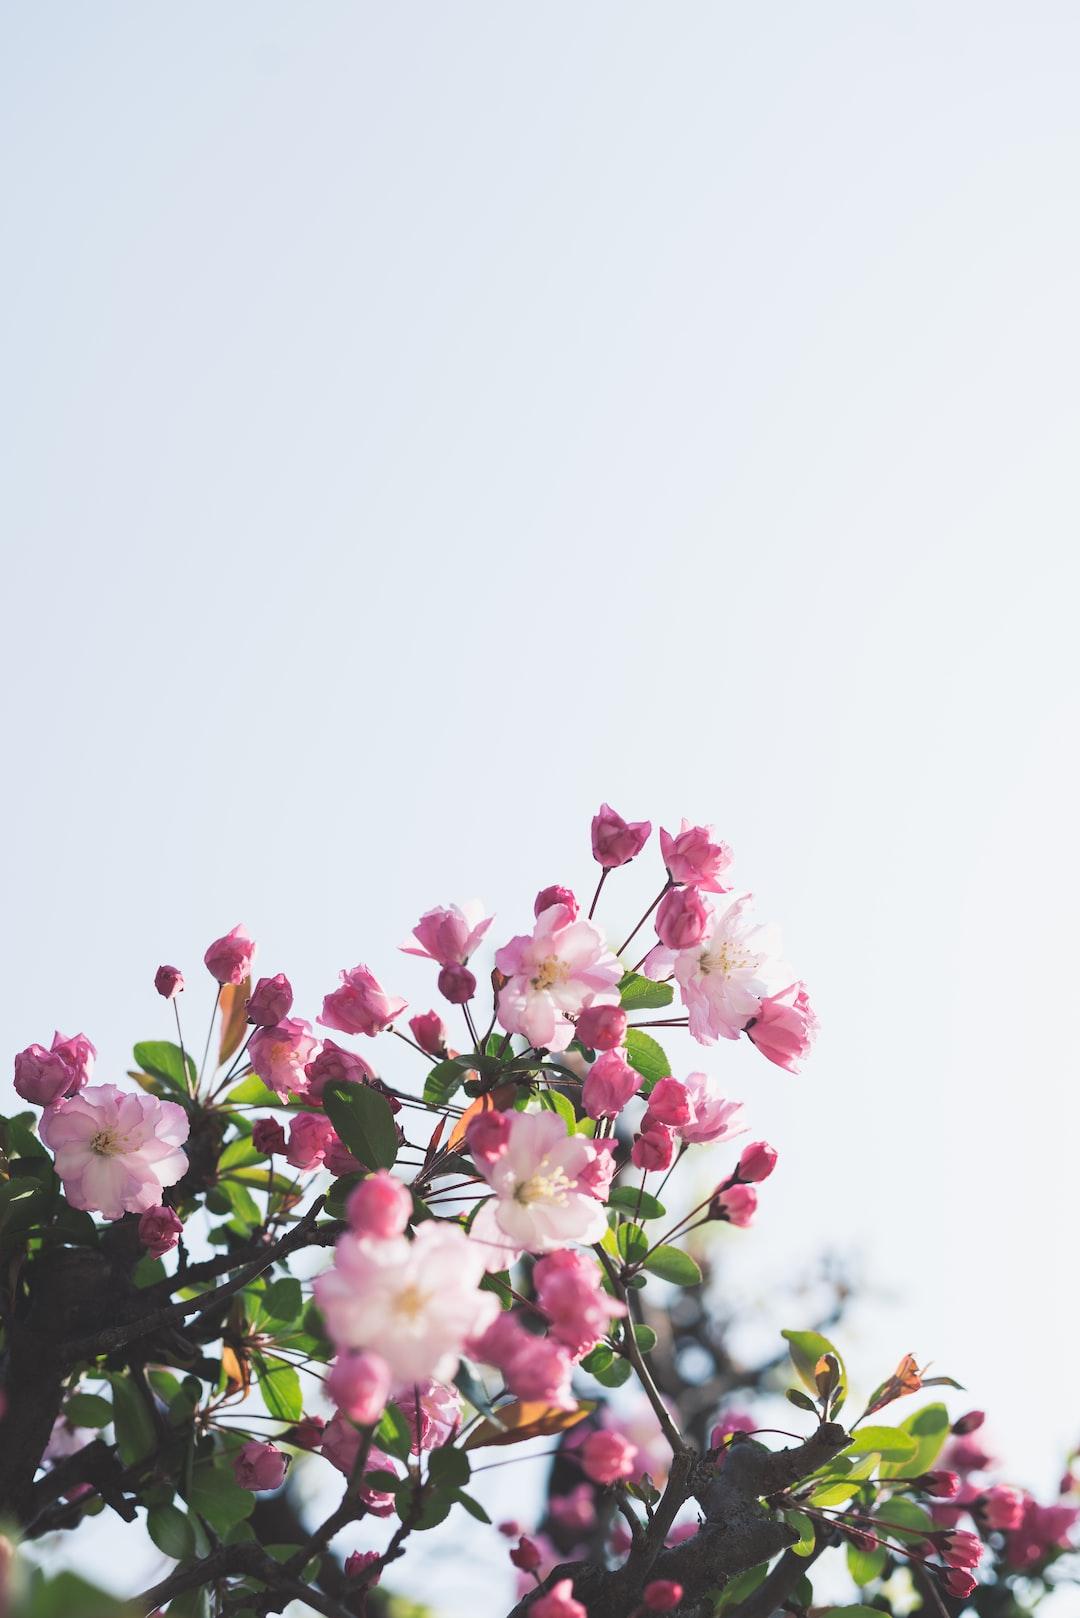 Spring Pictures Download Free Images On Unsplash